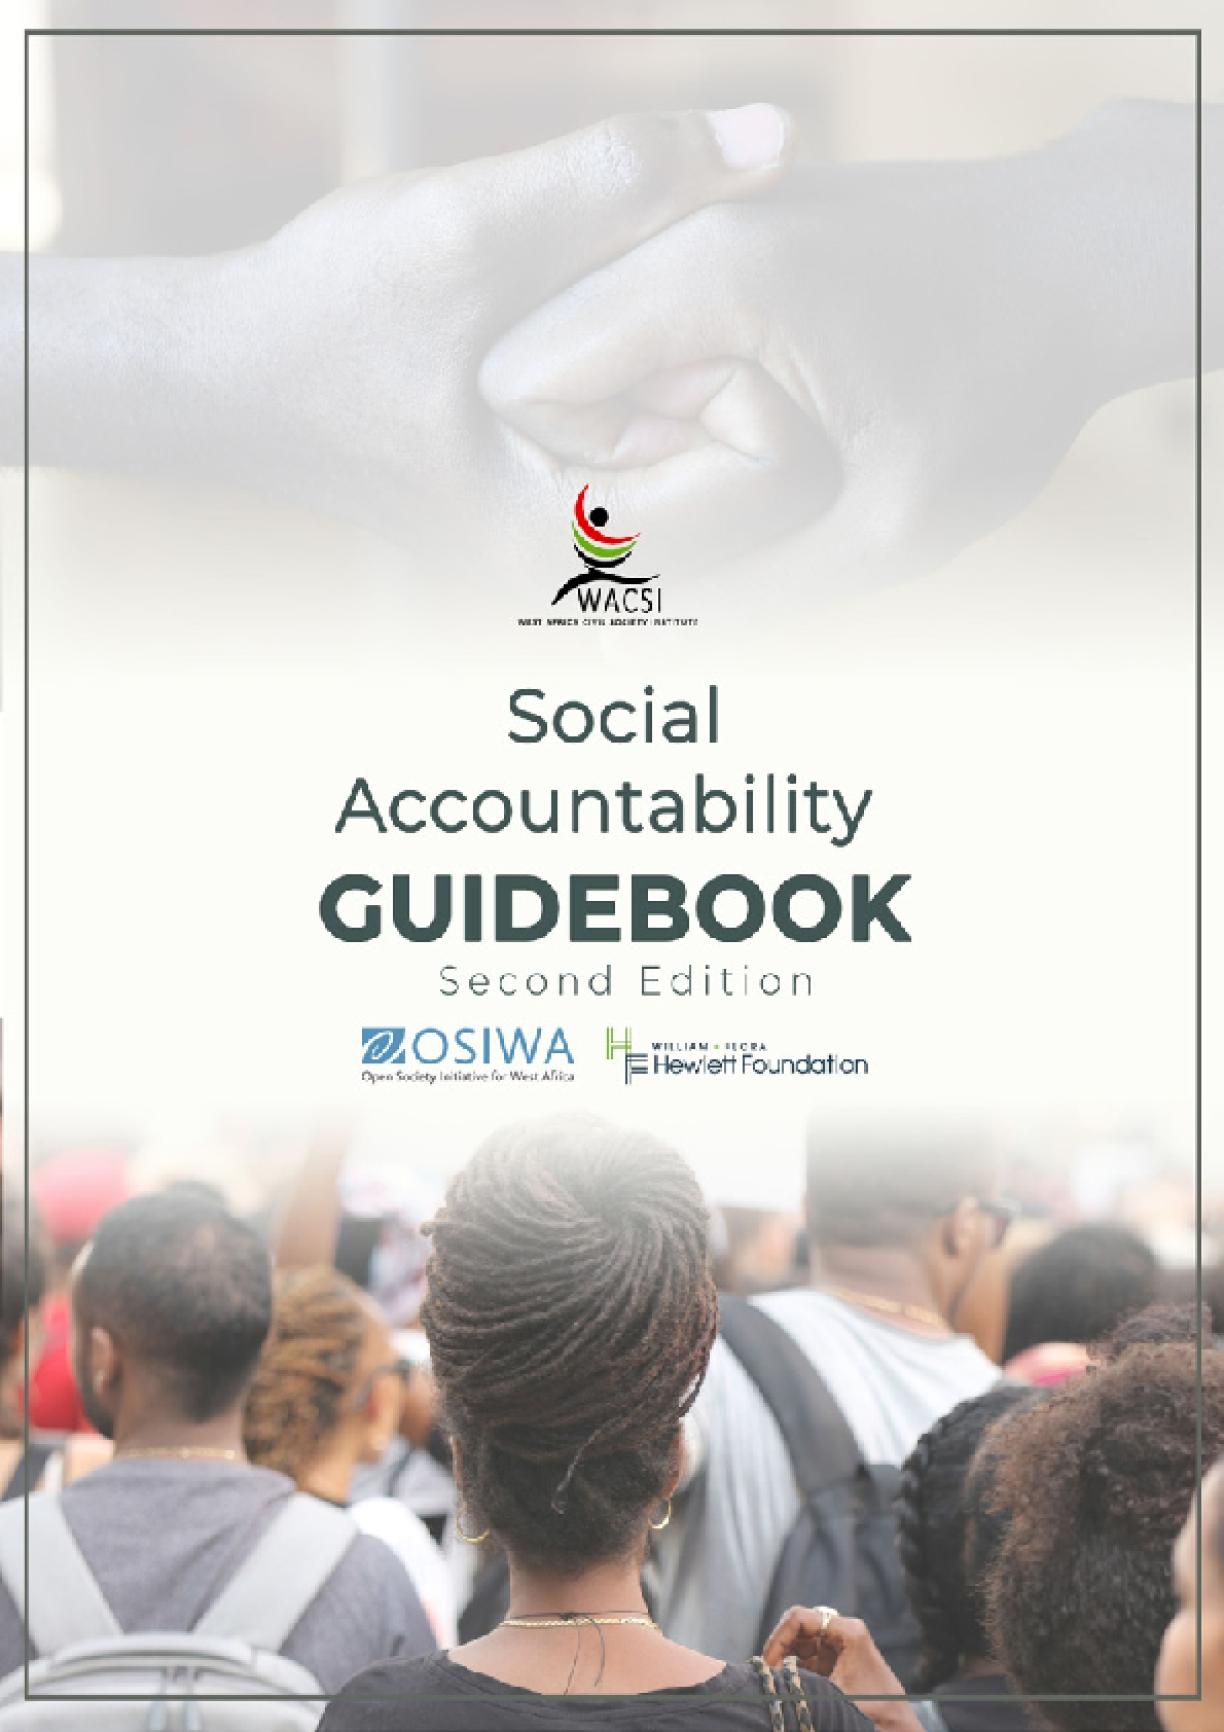 Social Accountability Guidebook (2nd Edition)